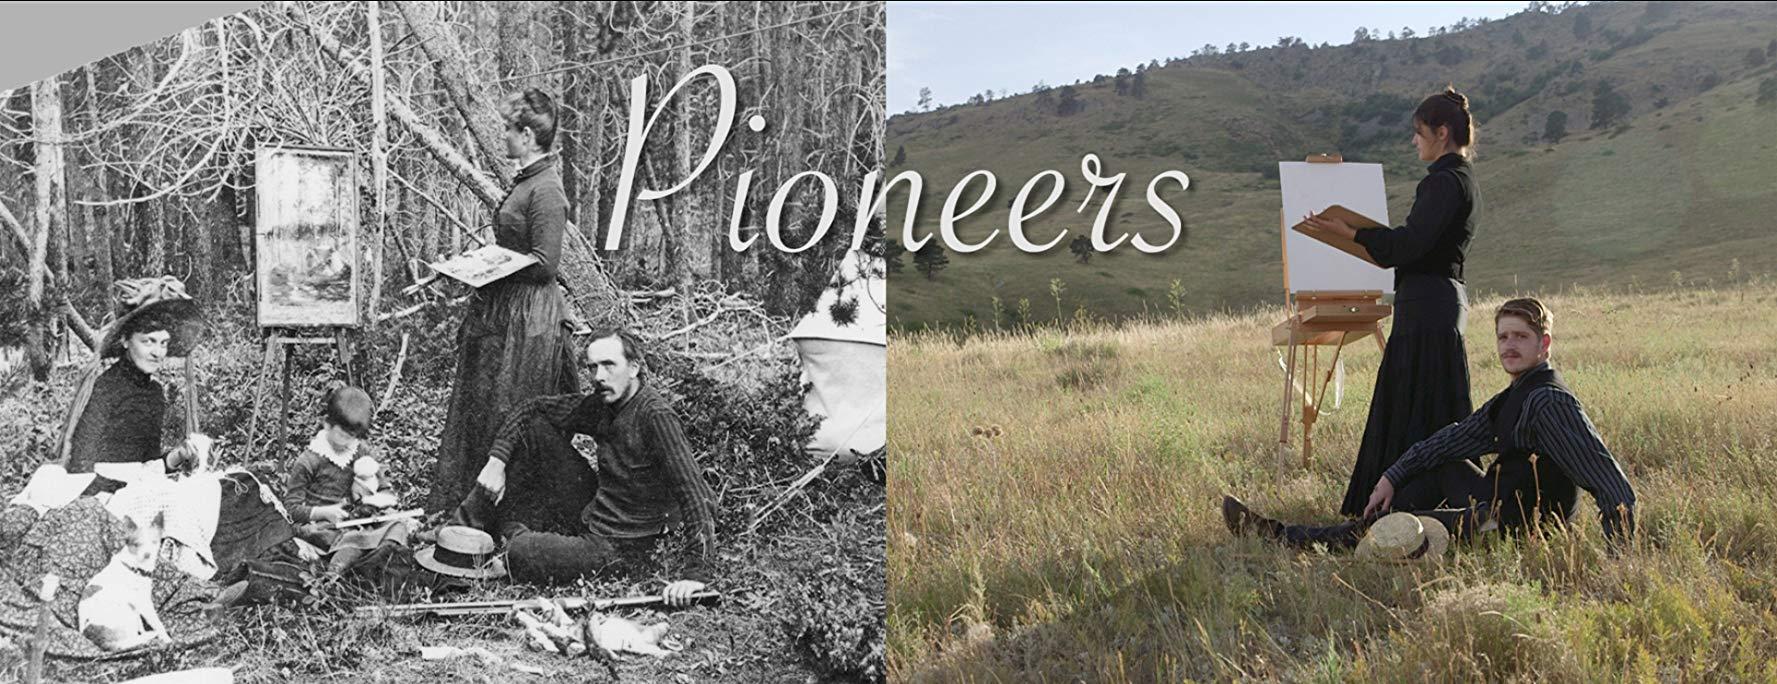 فيلم Pioneer 2016 مترجم